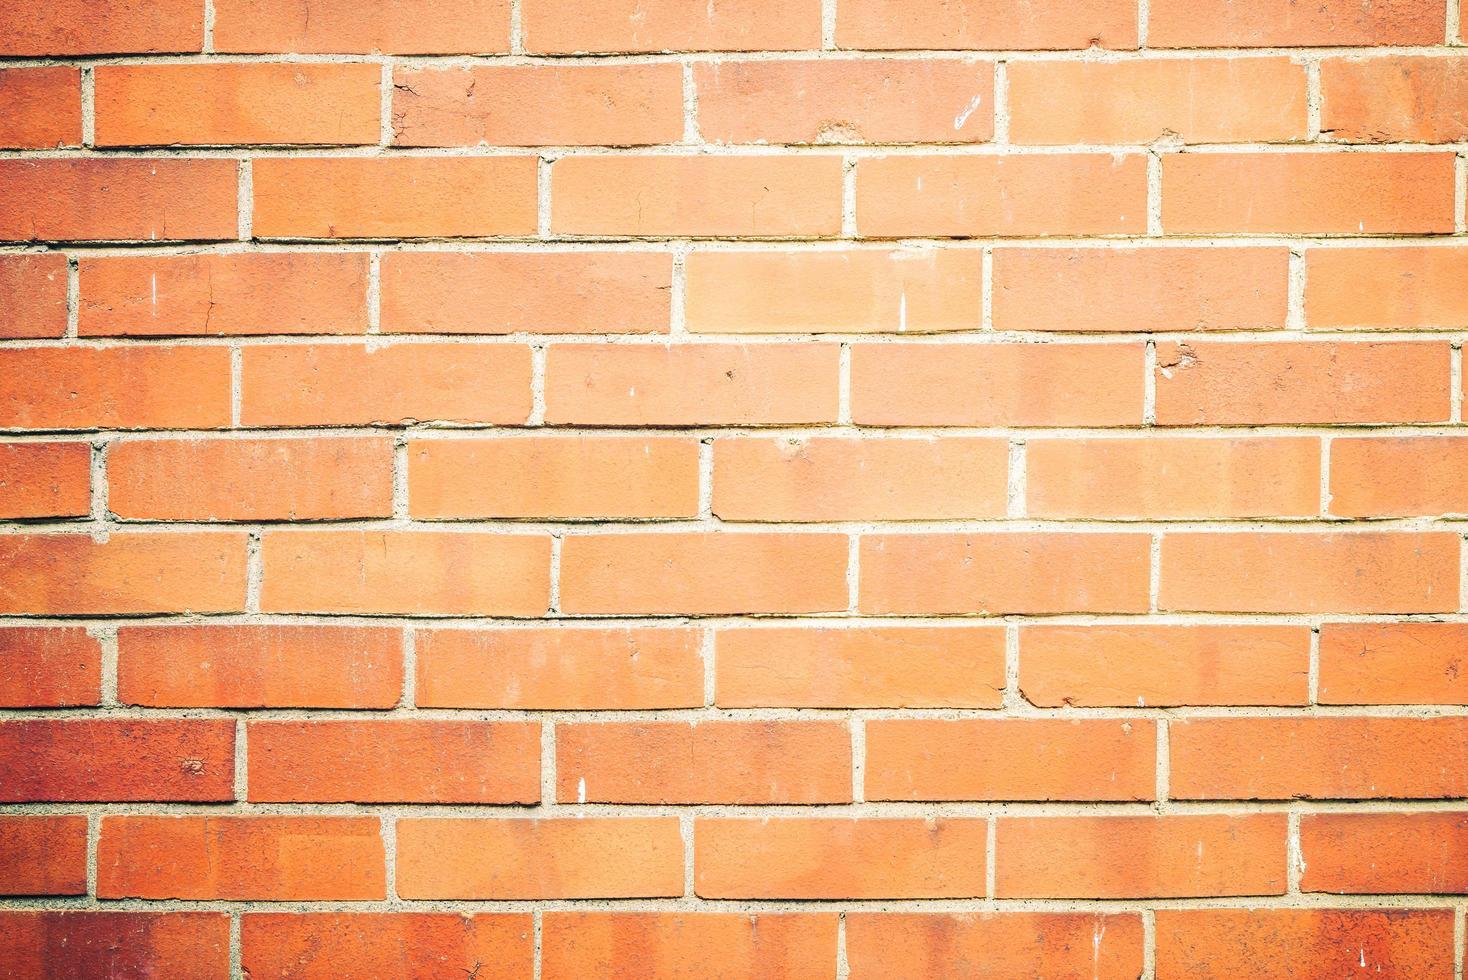 Fondo de pared de ladrillo de piedra antigua foto